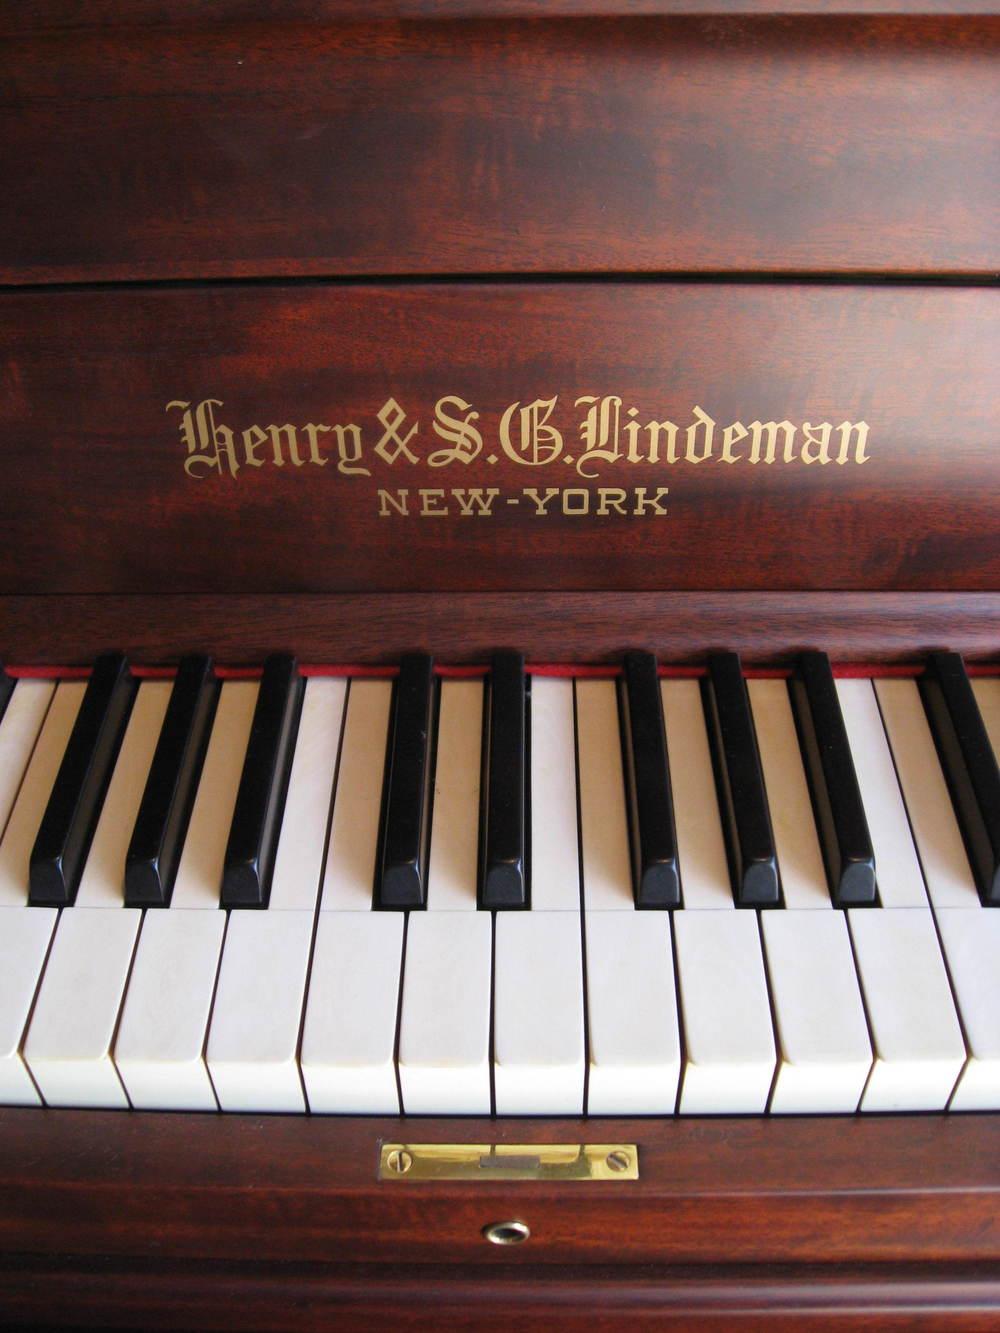 Henry & S.G. Lindeman Fallboard